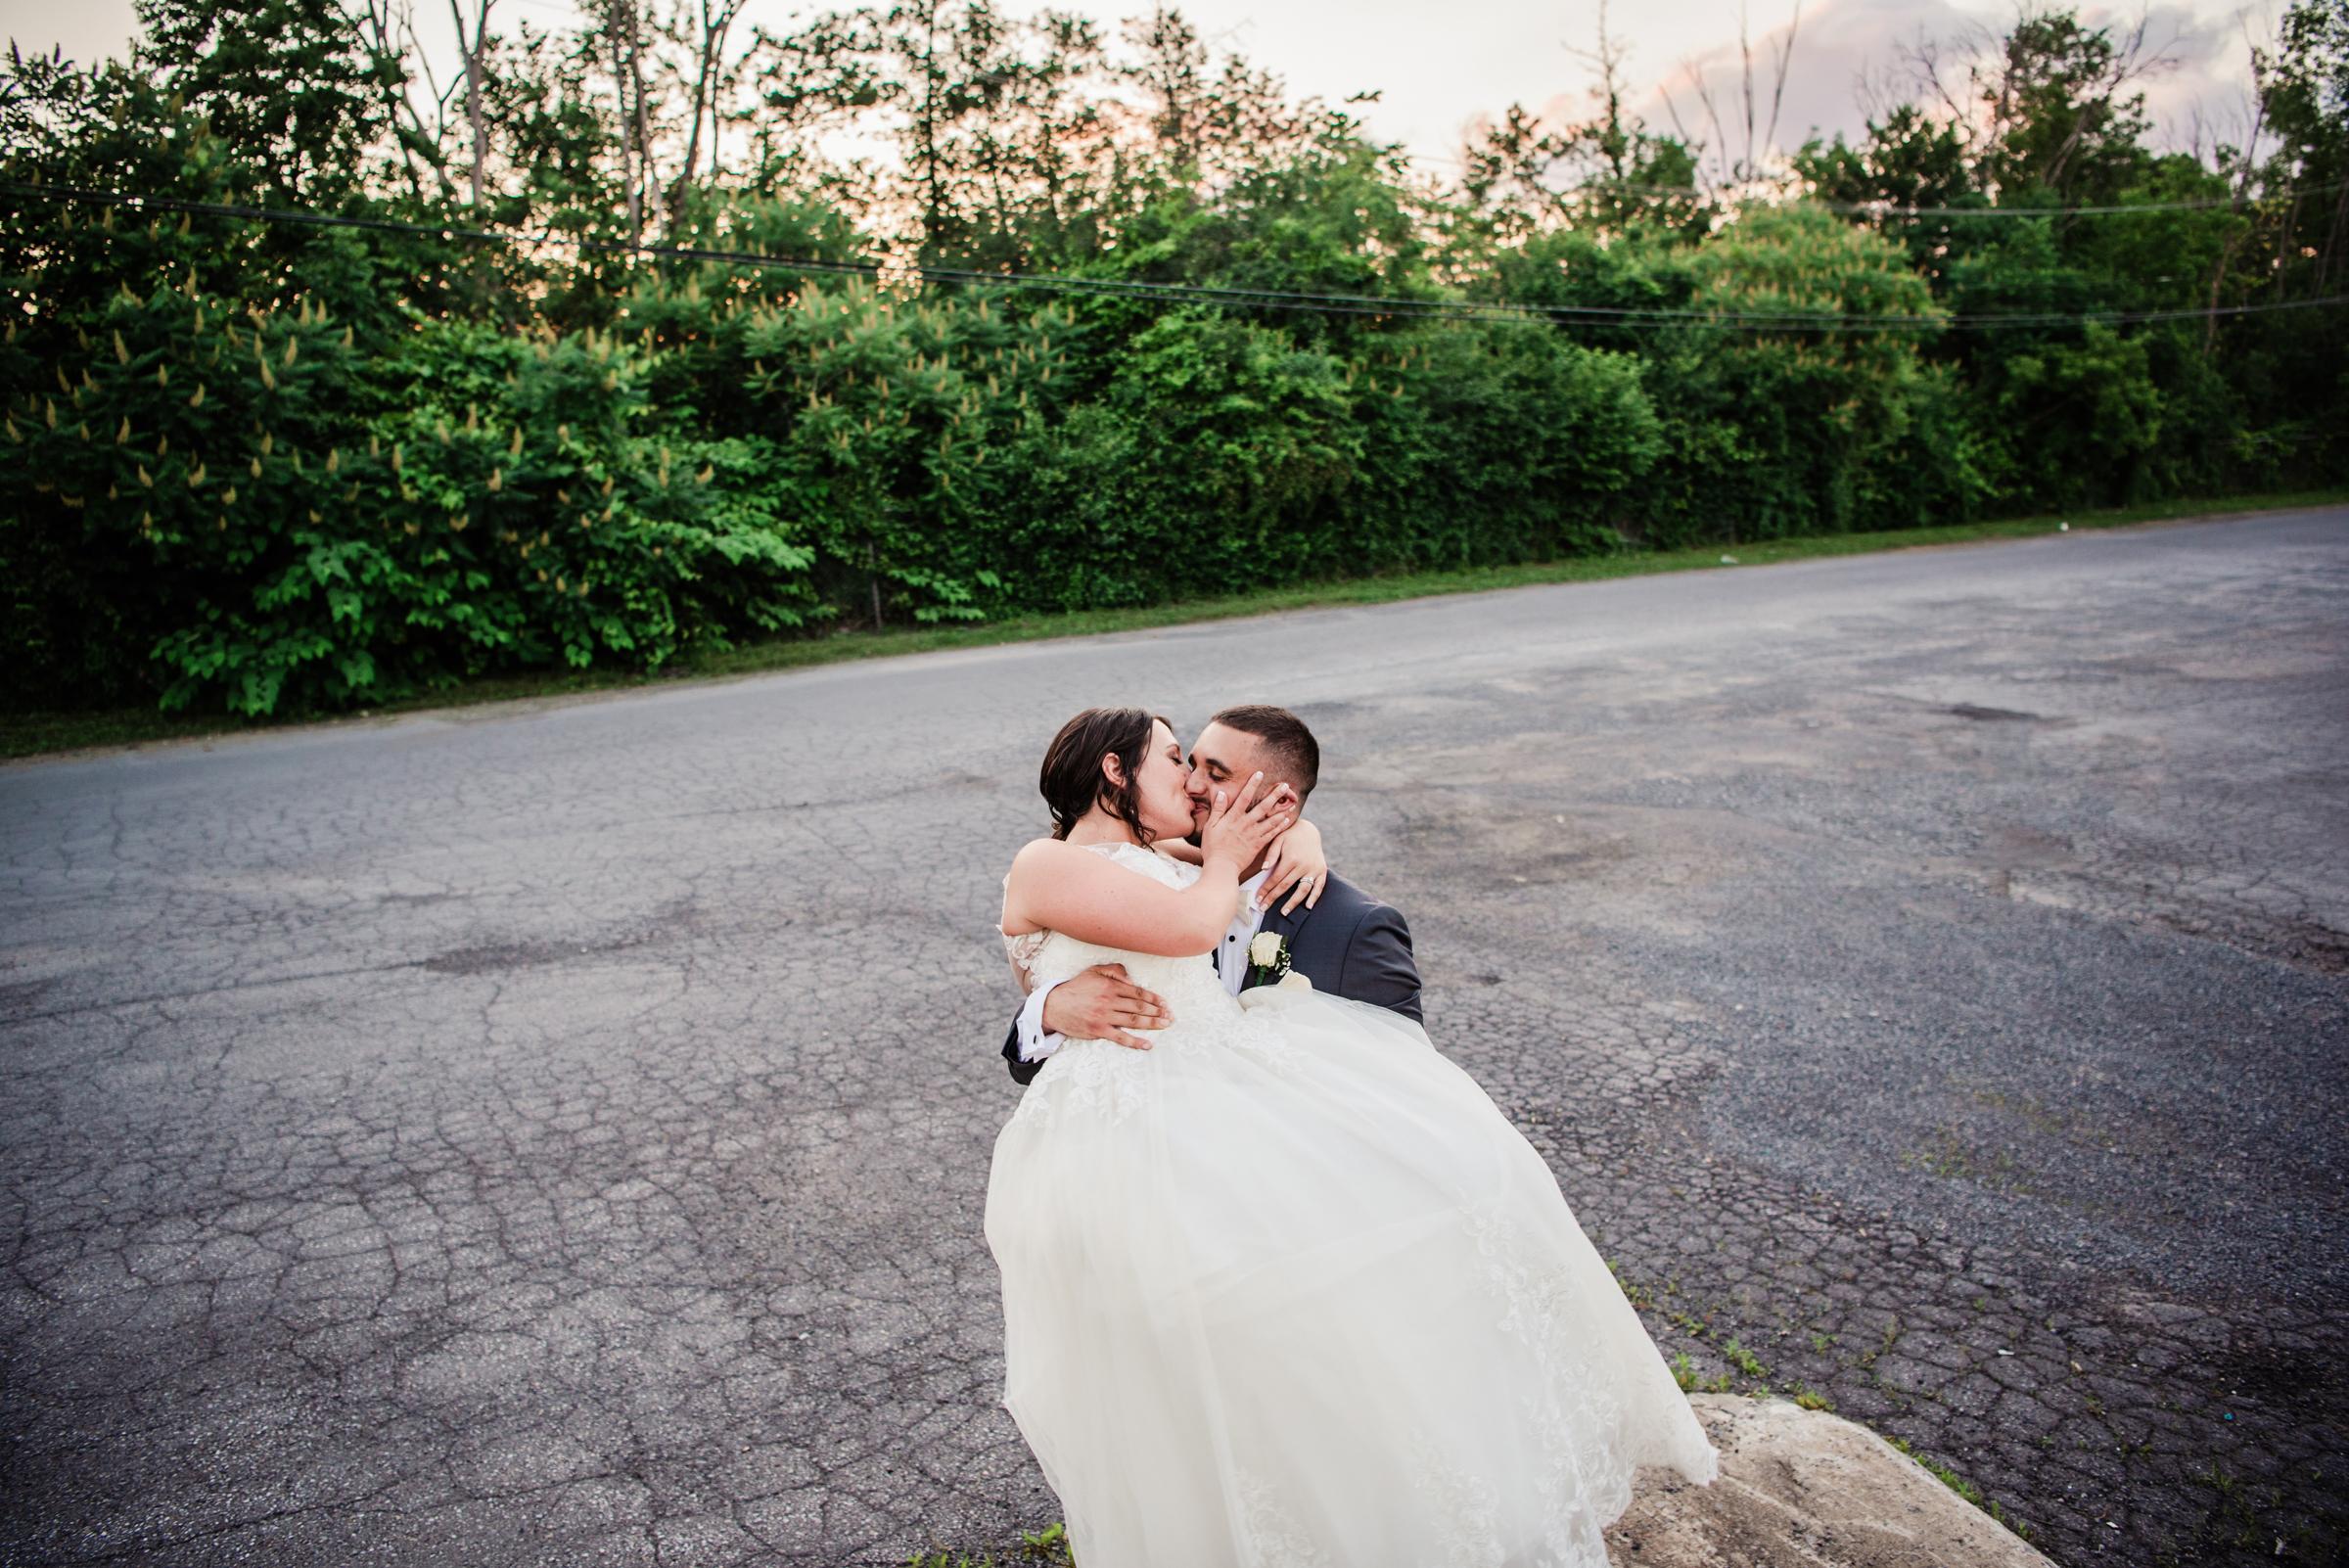 Historic_Old_St_Johns_Church_Valentinos_Banquet_Hall_Central_NY_Wedding_JILL_STUDIO_Rochester_NY_Photographer_DSC_6968.jpg